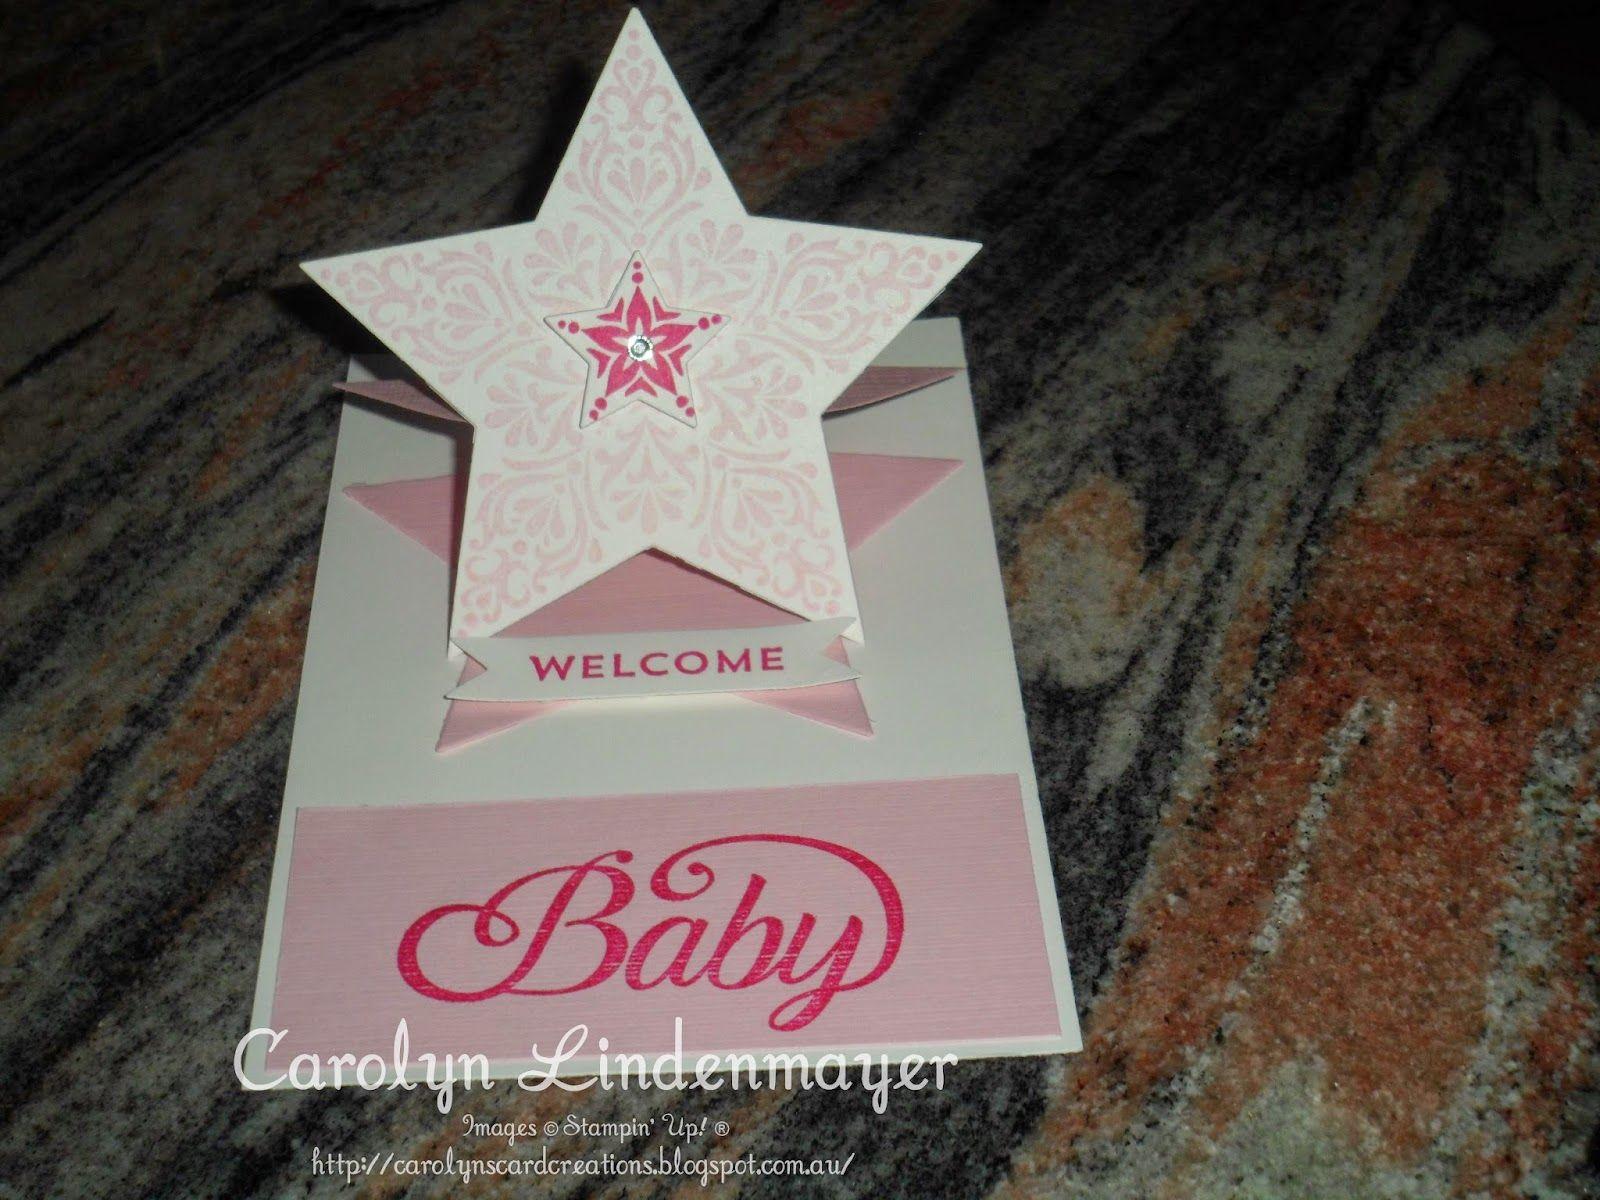 Carolyn's Card Creations: Welcome Baby Girl